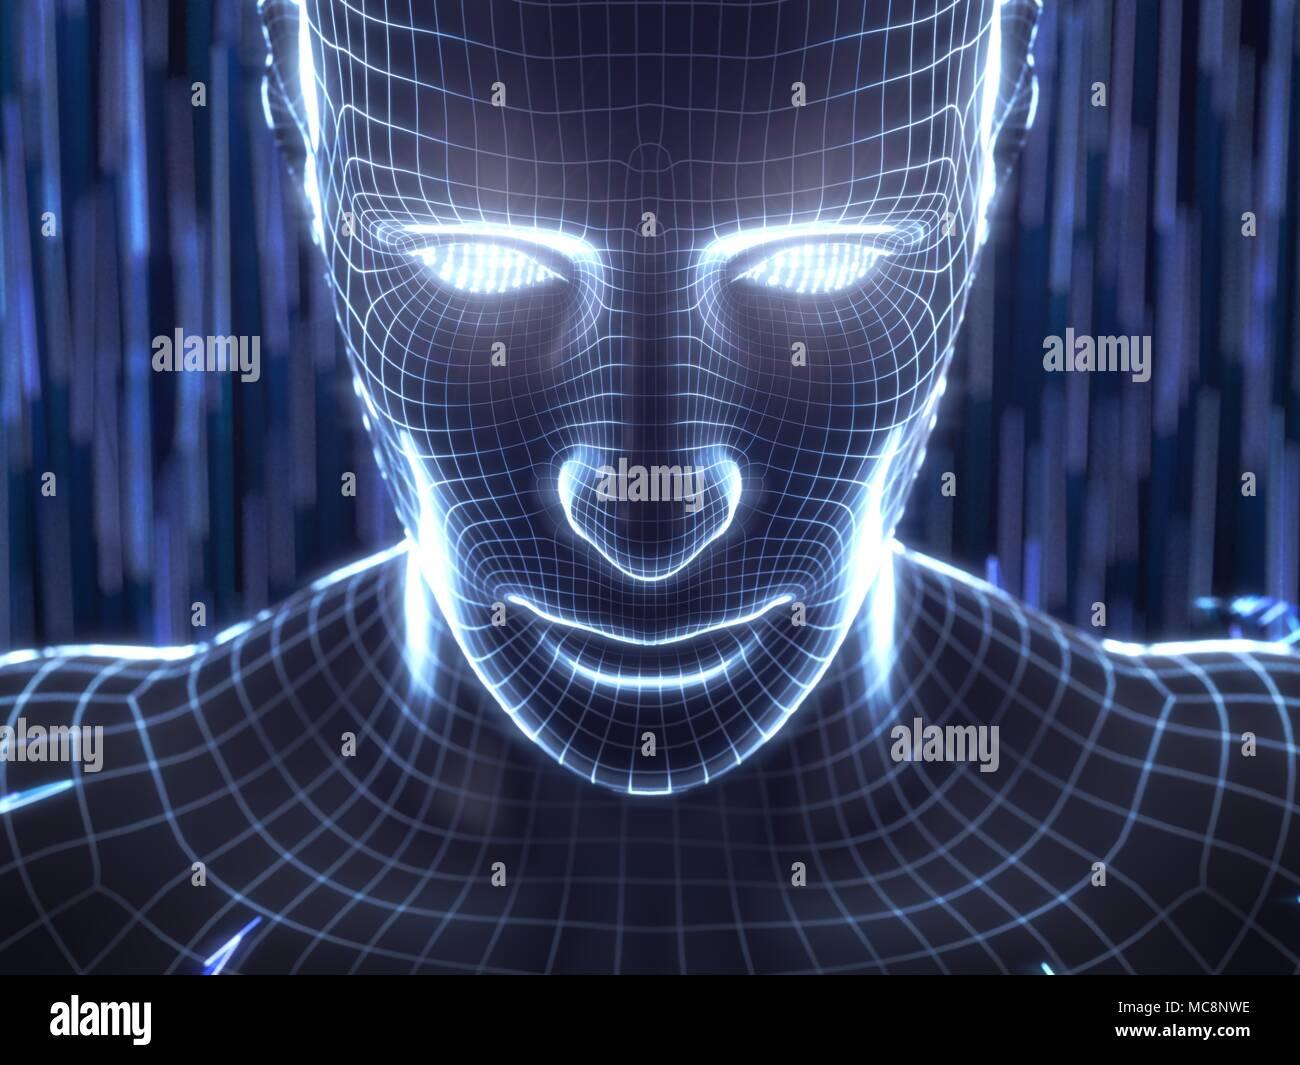 Concepto de inteligencia artificial con humano virtual avatar. Ilustración 3d. adecuado para la tecnología, la inteligencia artificial, minería de datos,profunda learnin Foto de stock